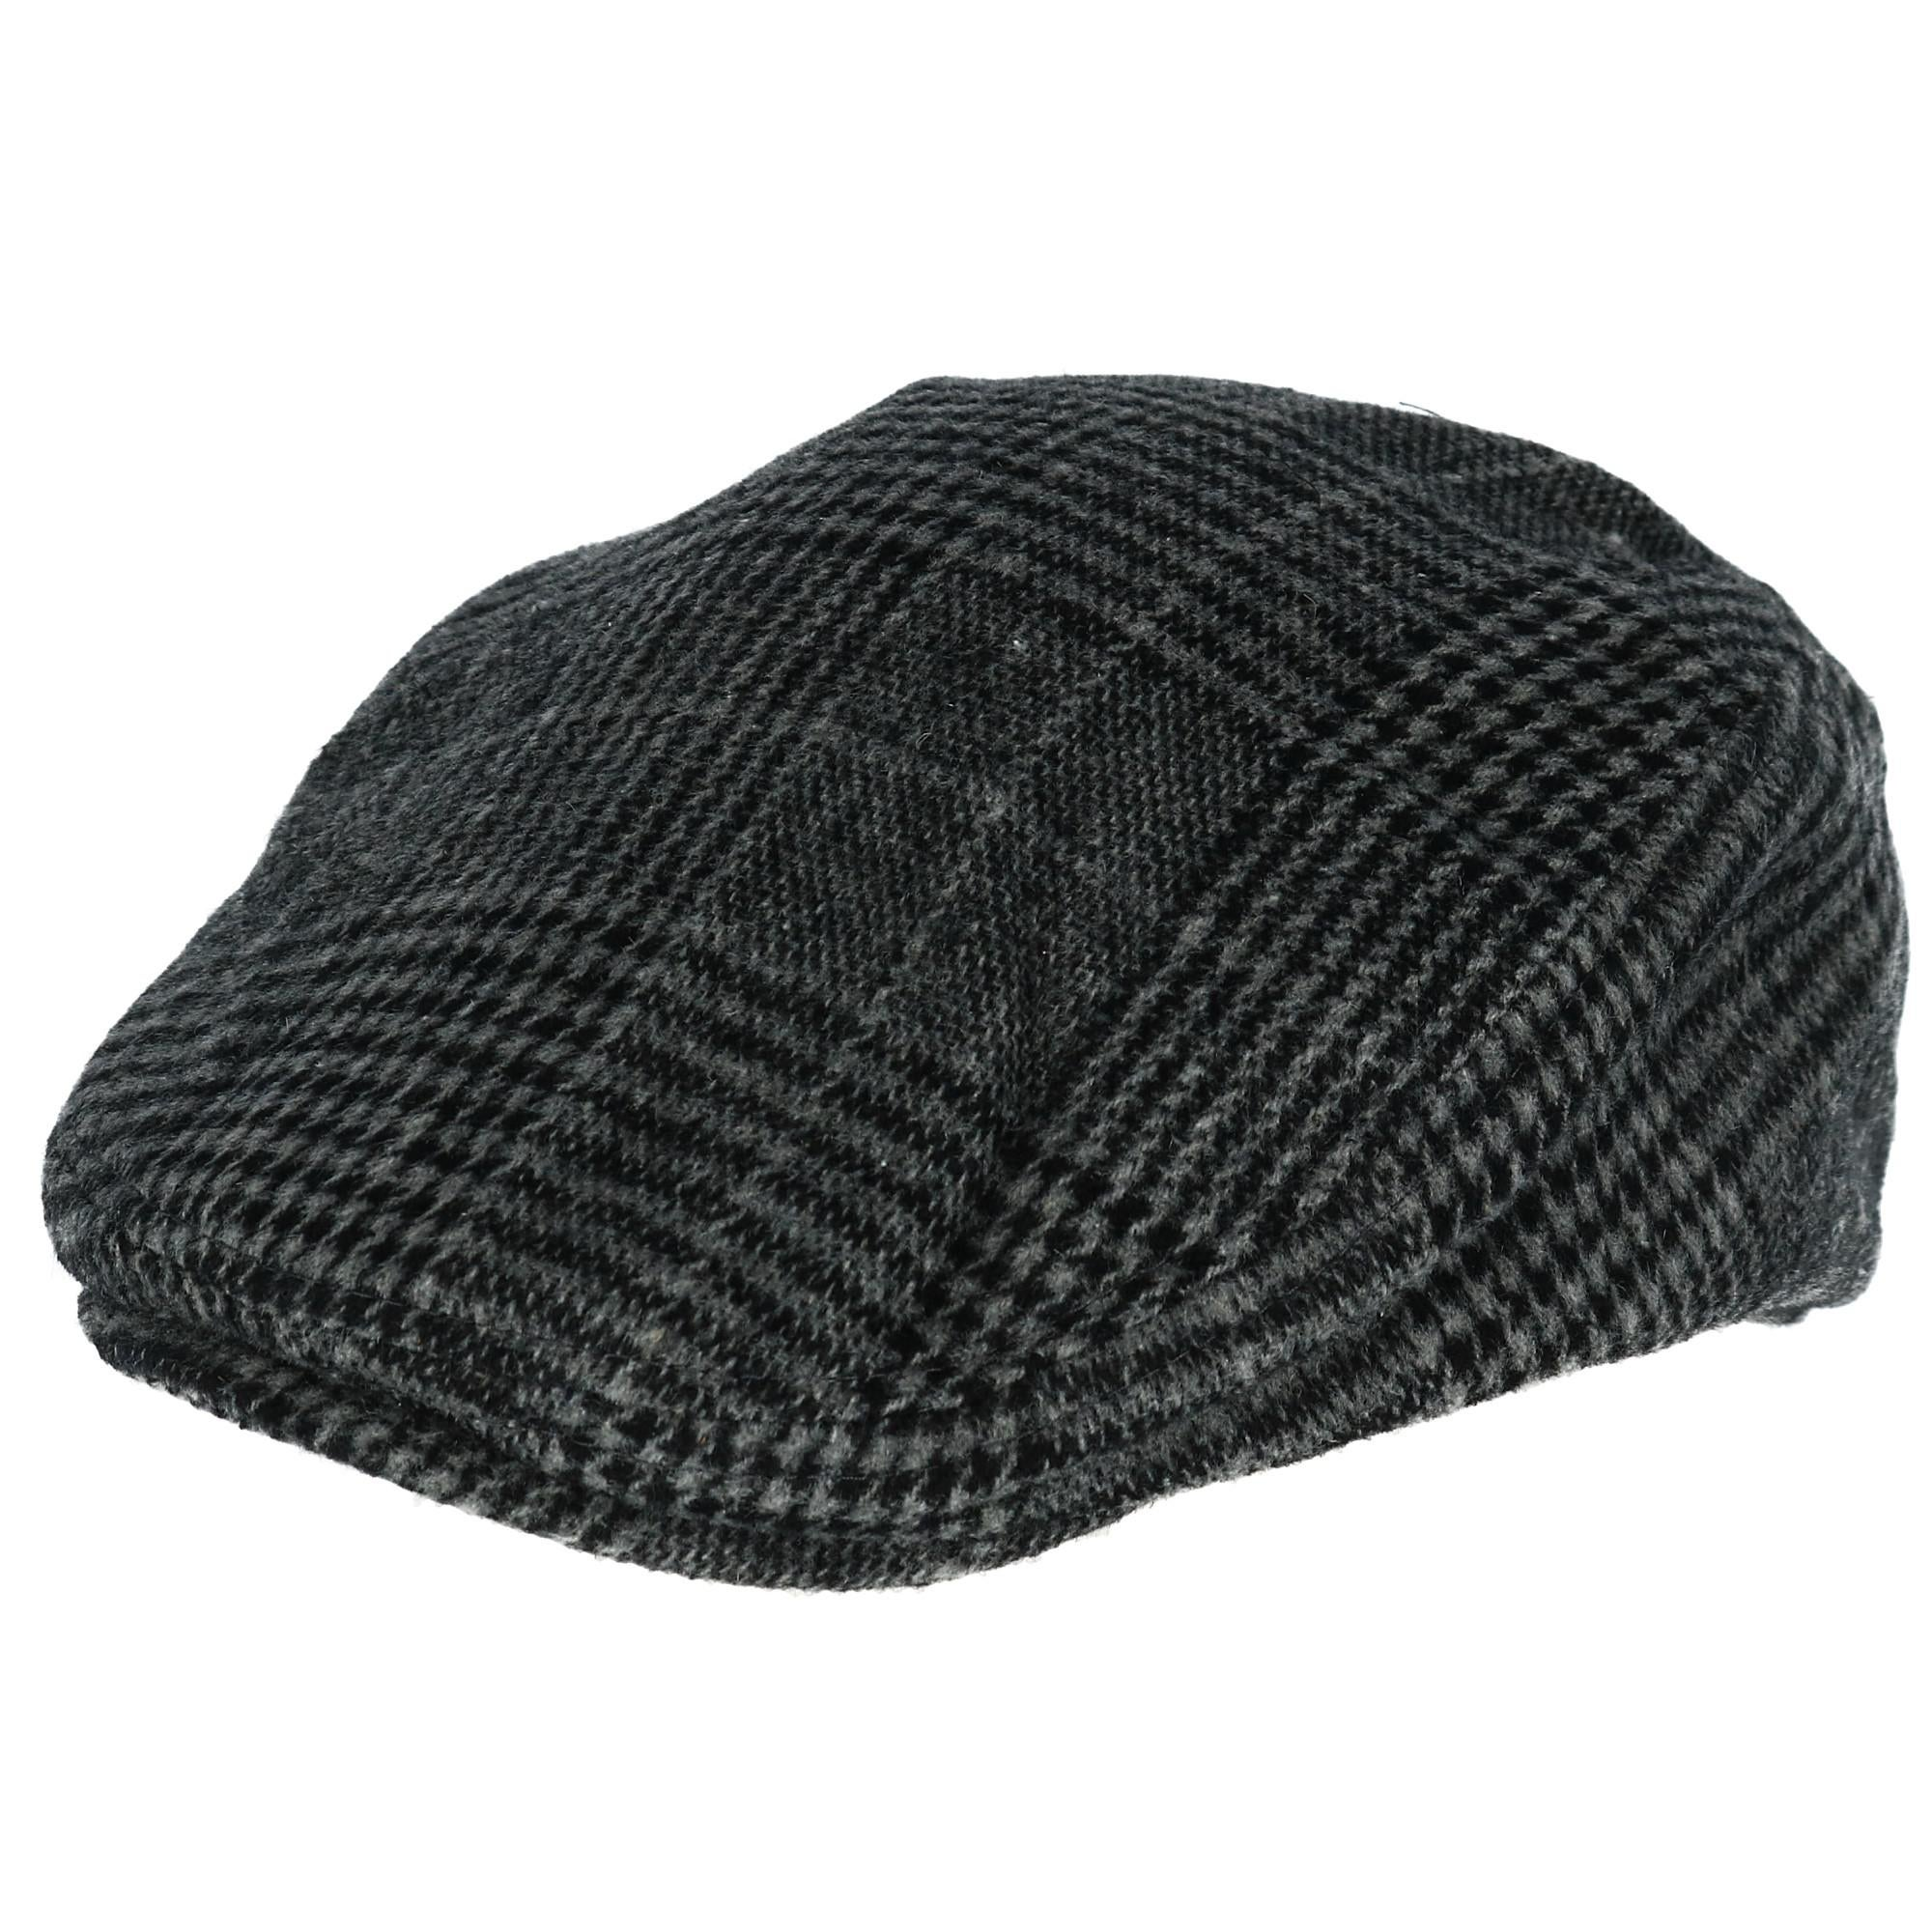 37ea53d5787ba Shop David   Young Men s Plaid Wool Ivy Cap - Free Shipping On ...